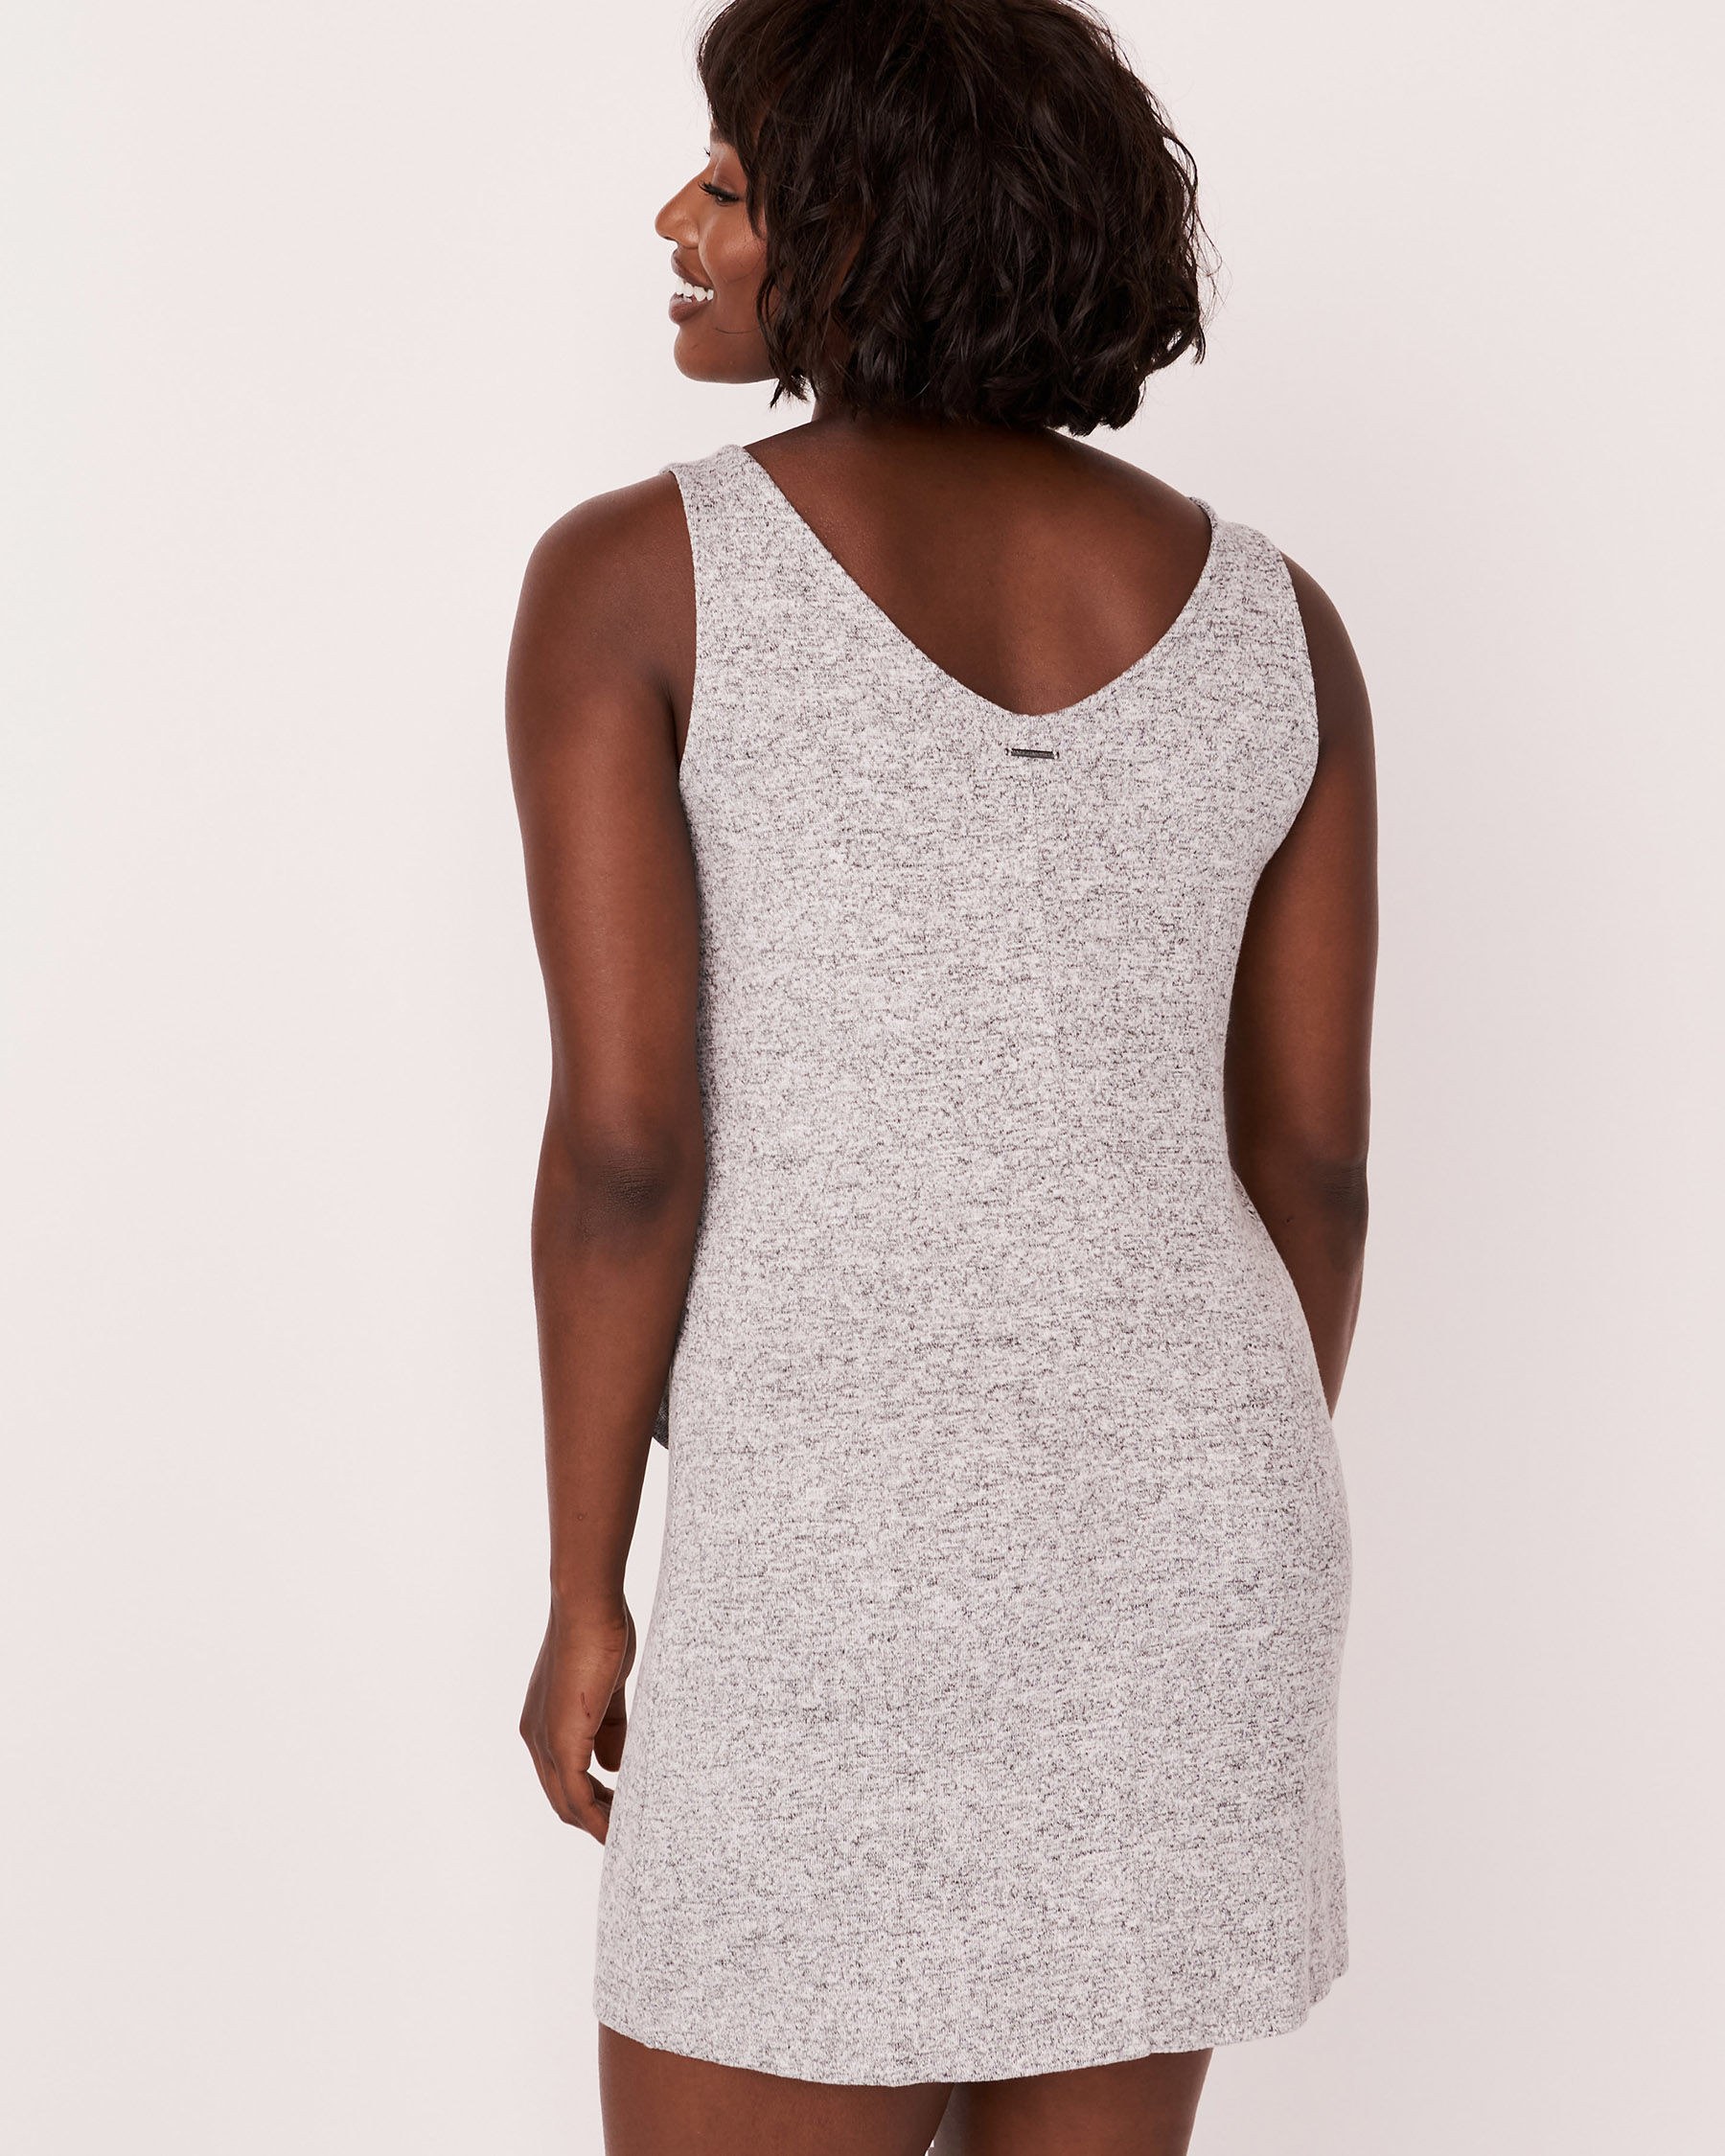 LA VIE EN ROSE Knotted V-neckline Sleeveless Dress Grey 766-474-0-11 - View5